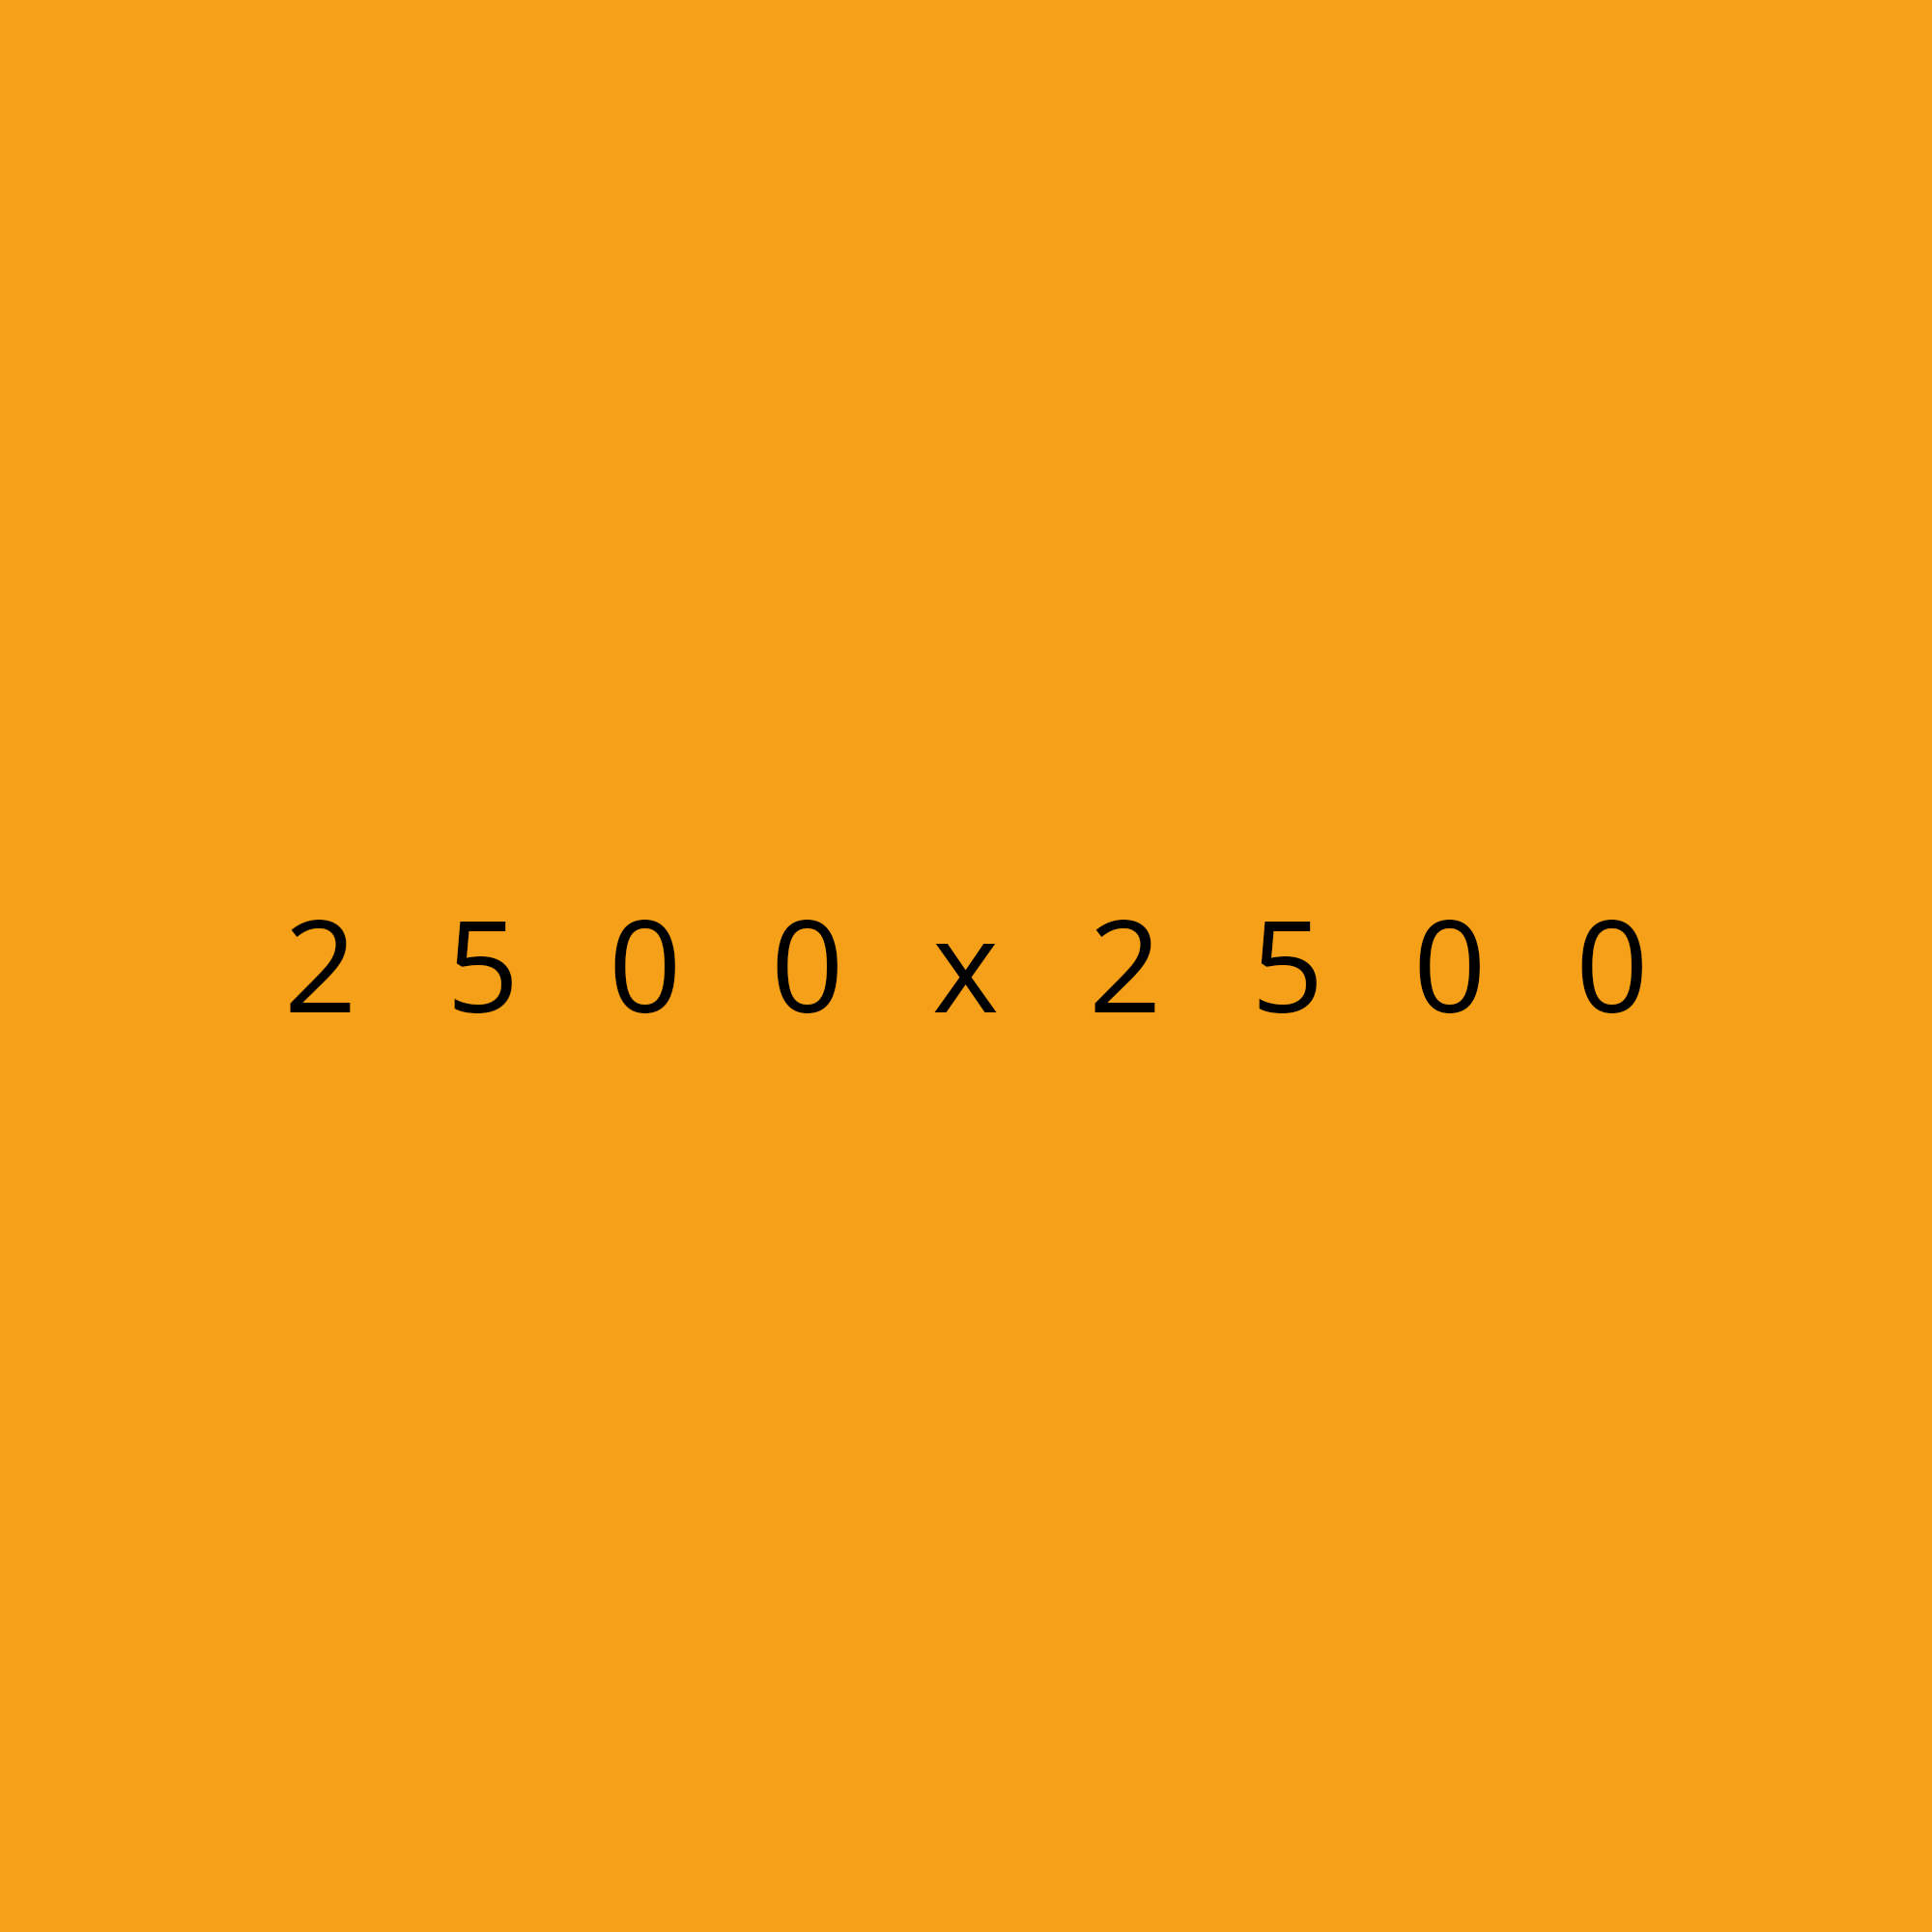 2500x2500-1